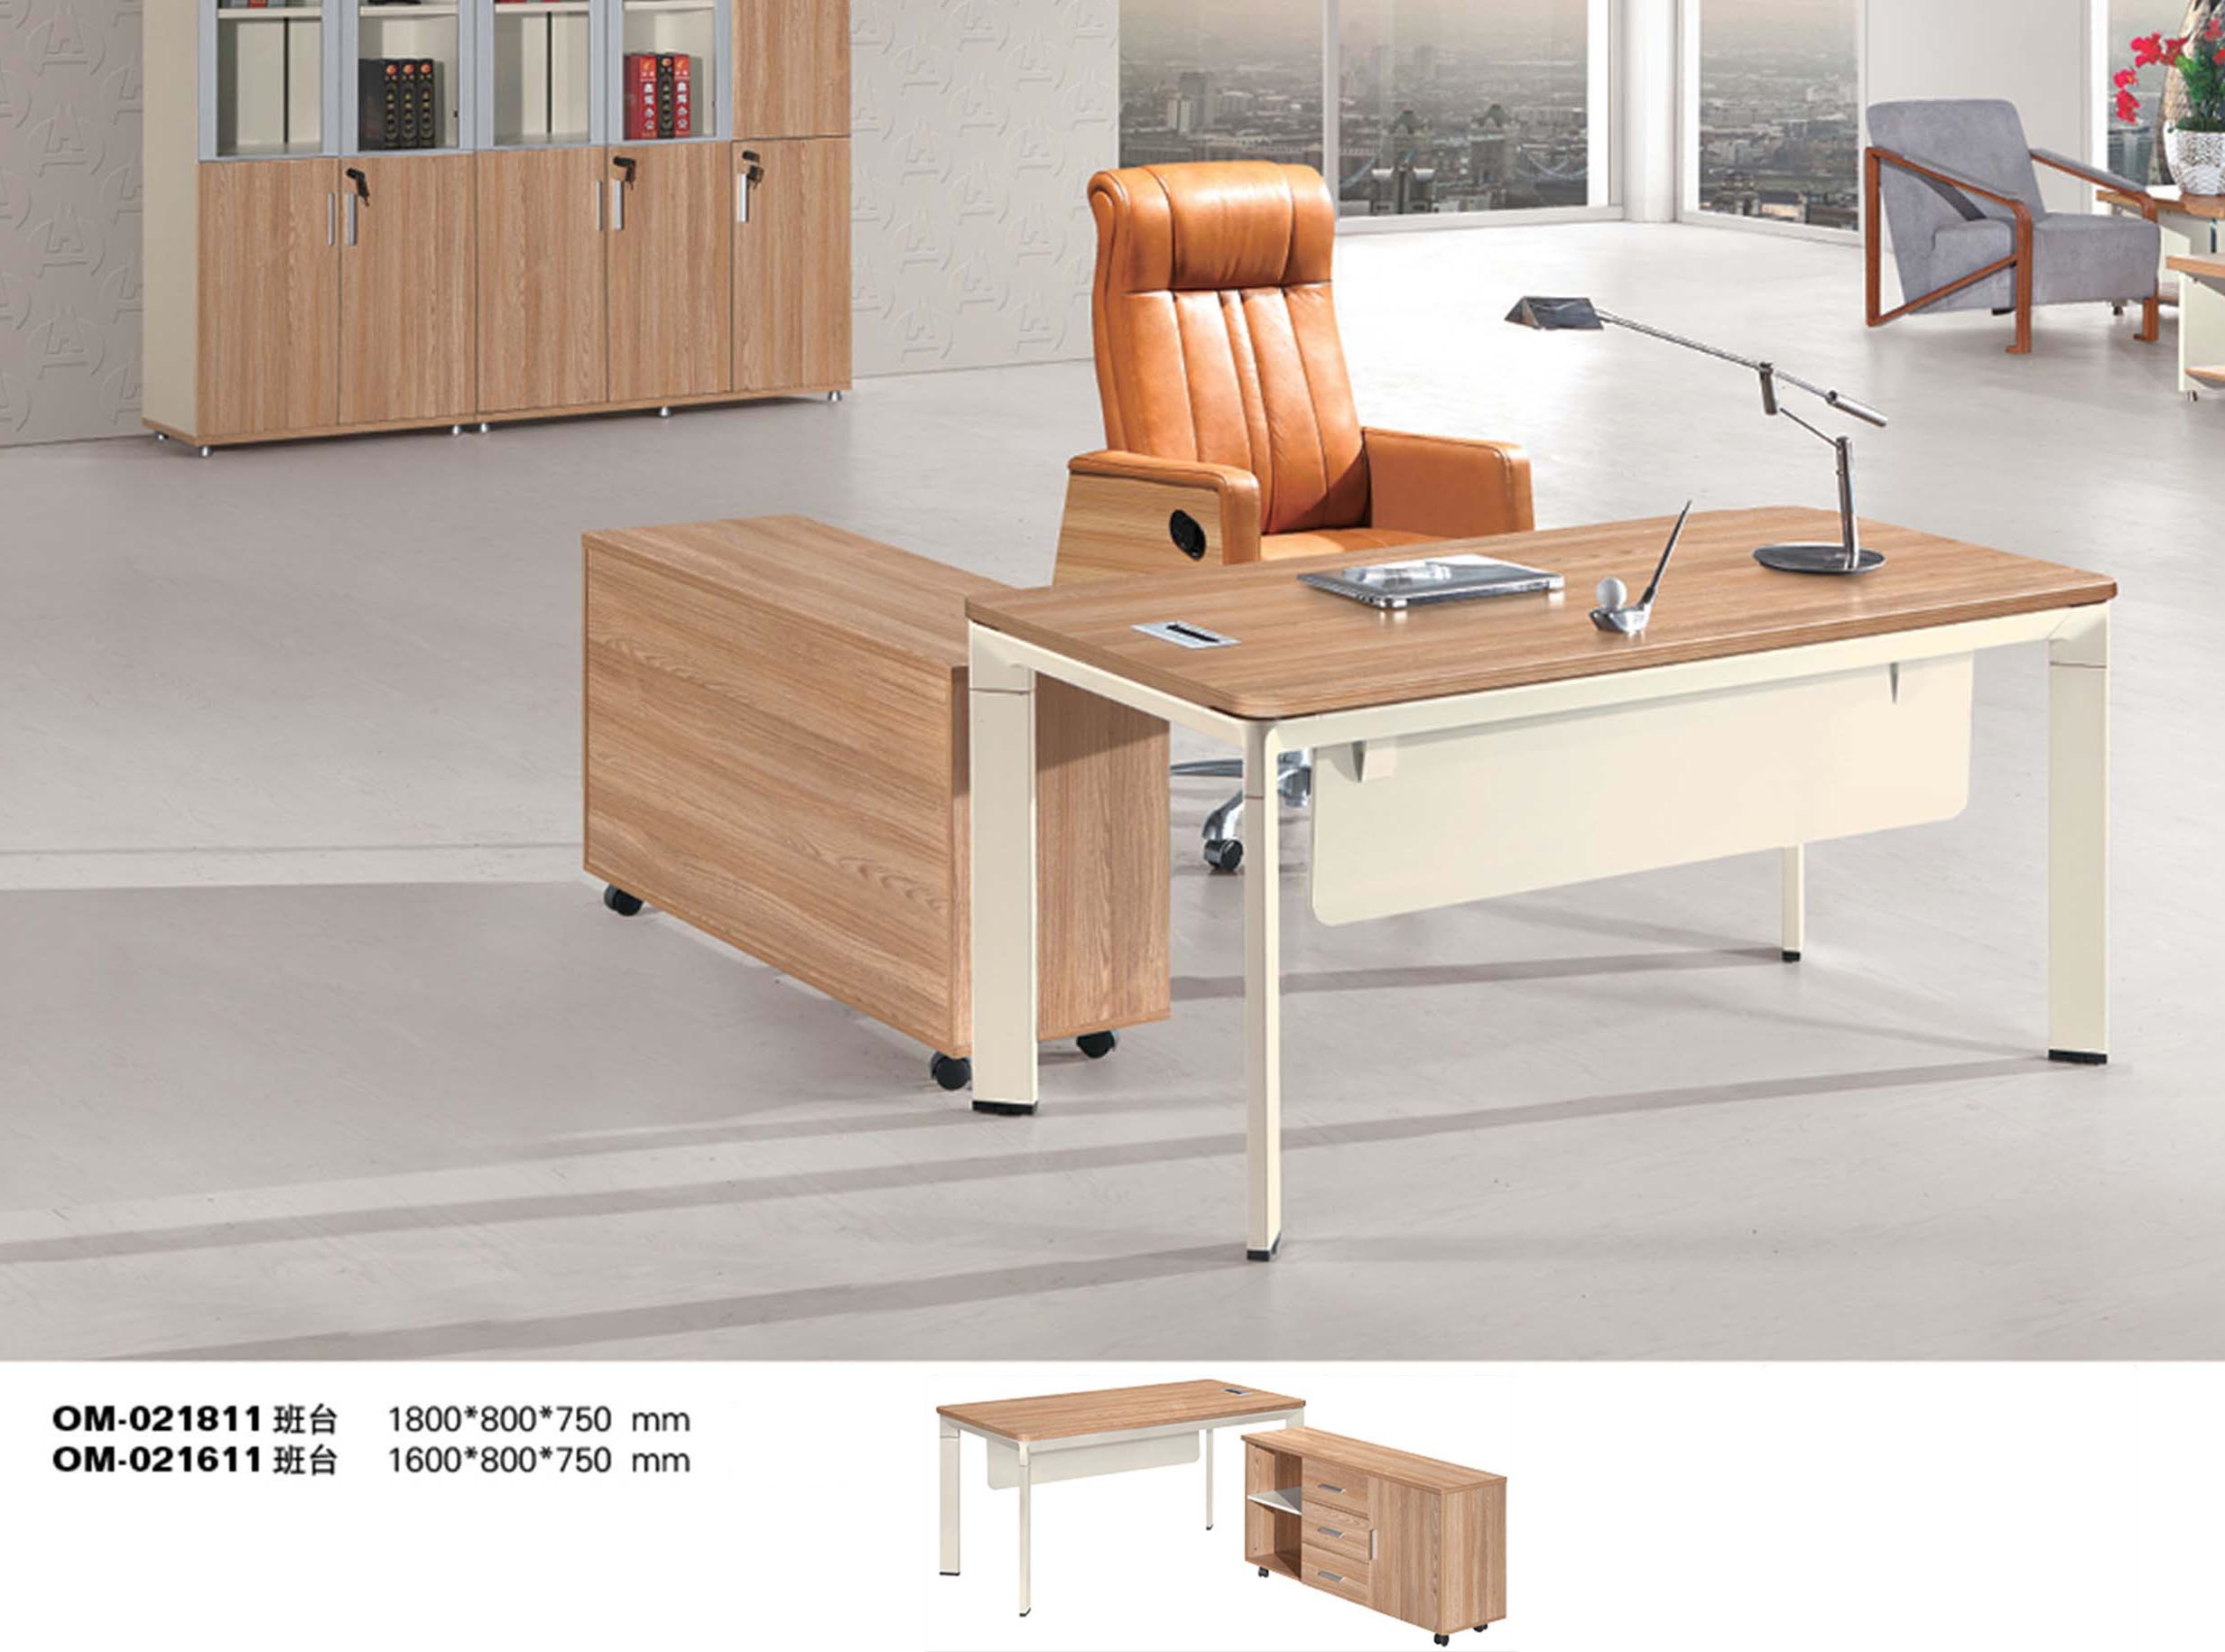 Modern Boss Computer Table Wooden Executive Office Desk